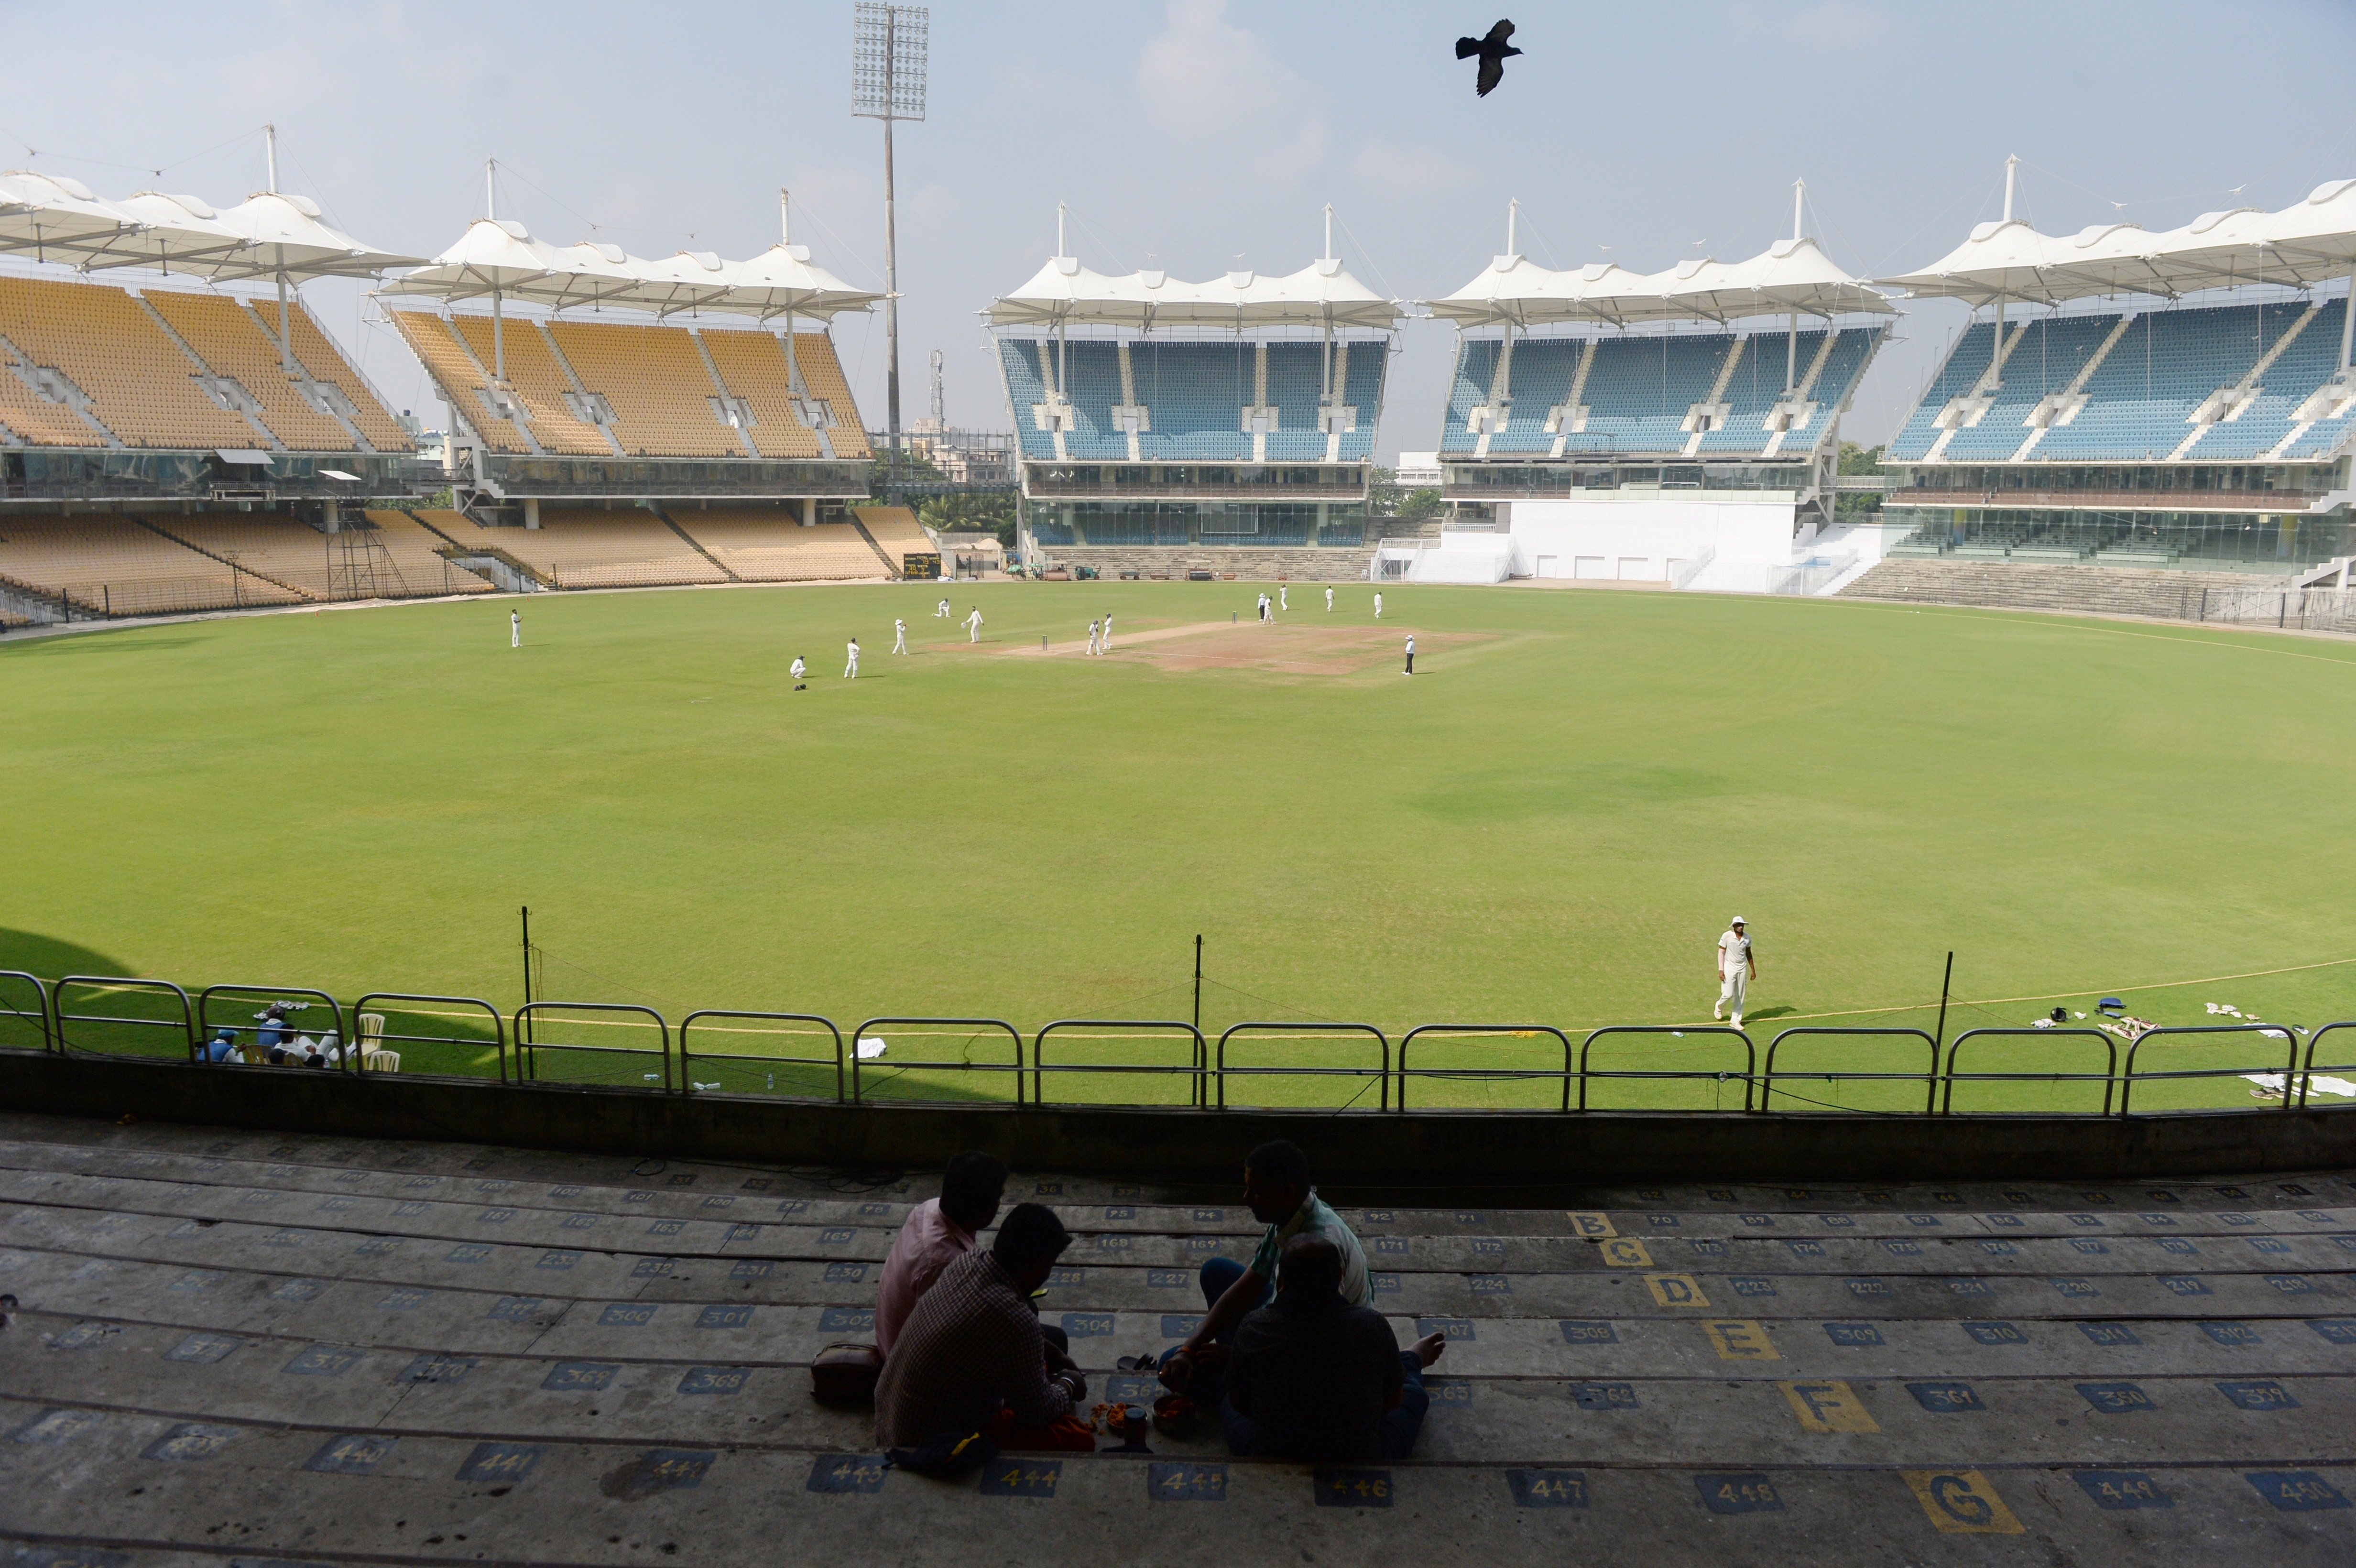 IPL 2019 Cricket Grounds, Venues List| List of Cricket Stadiums of